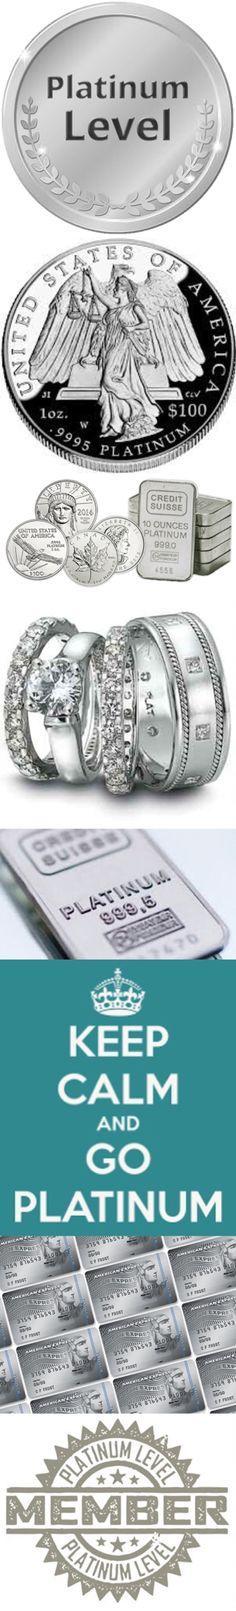 #Platinum Love - Collage by #Luxurydotcom